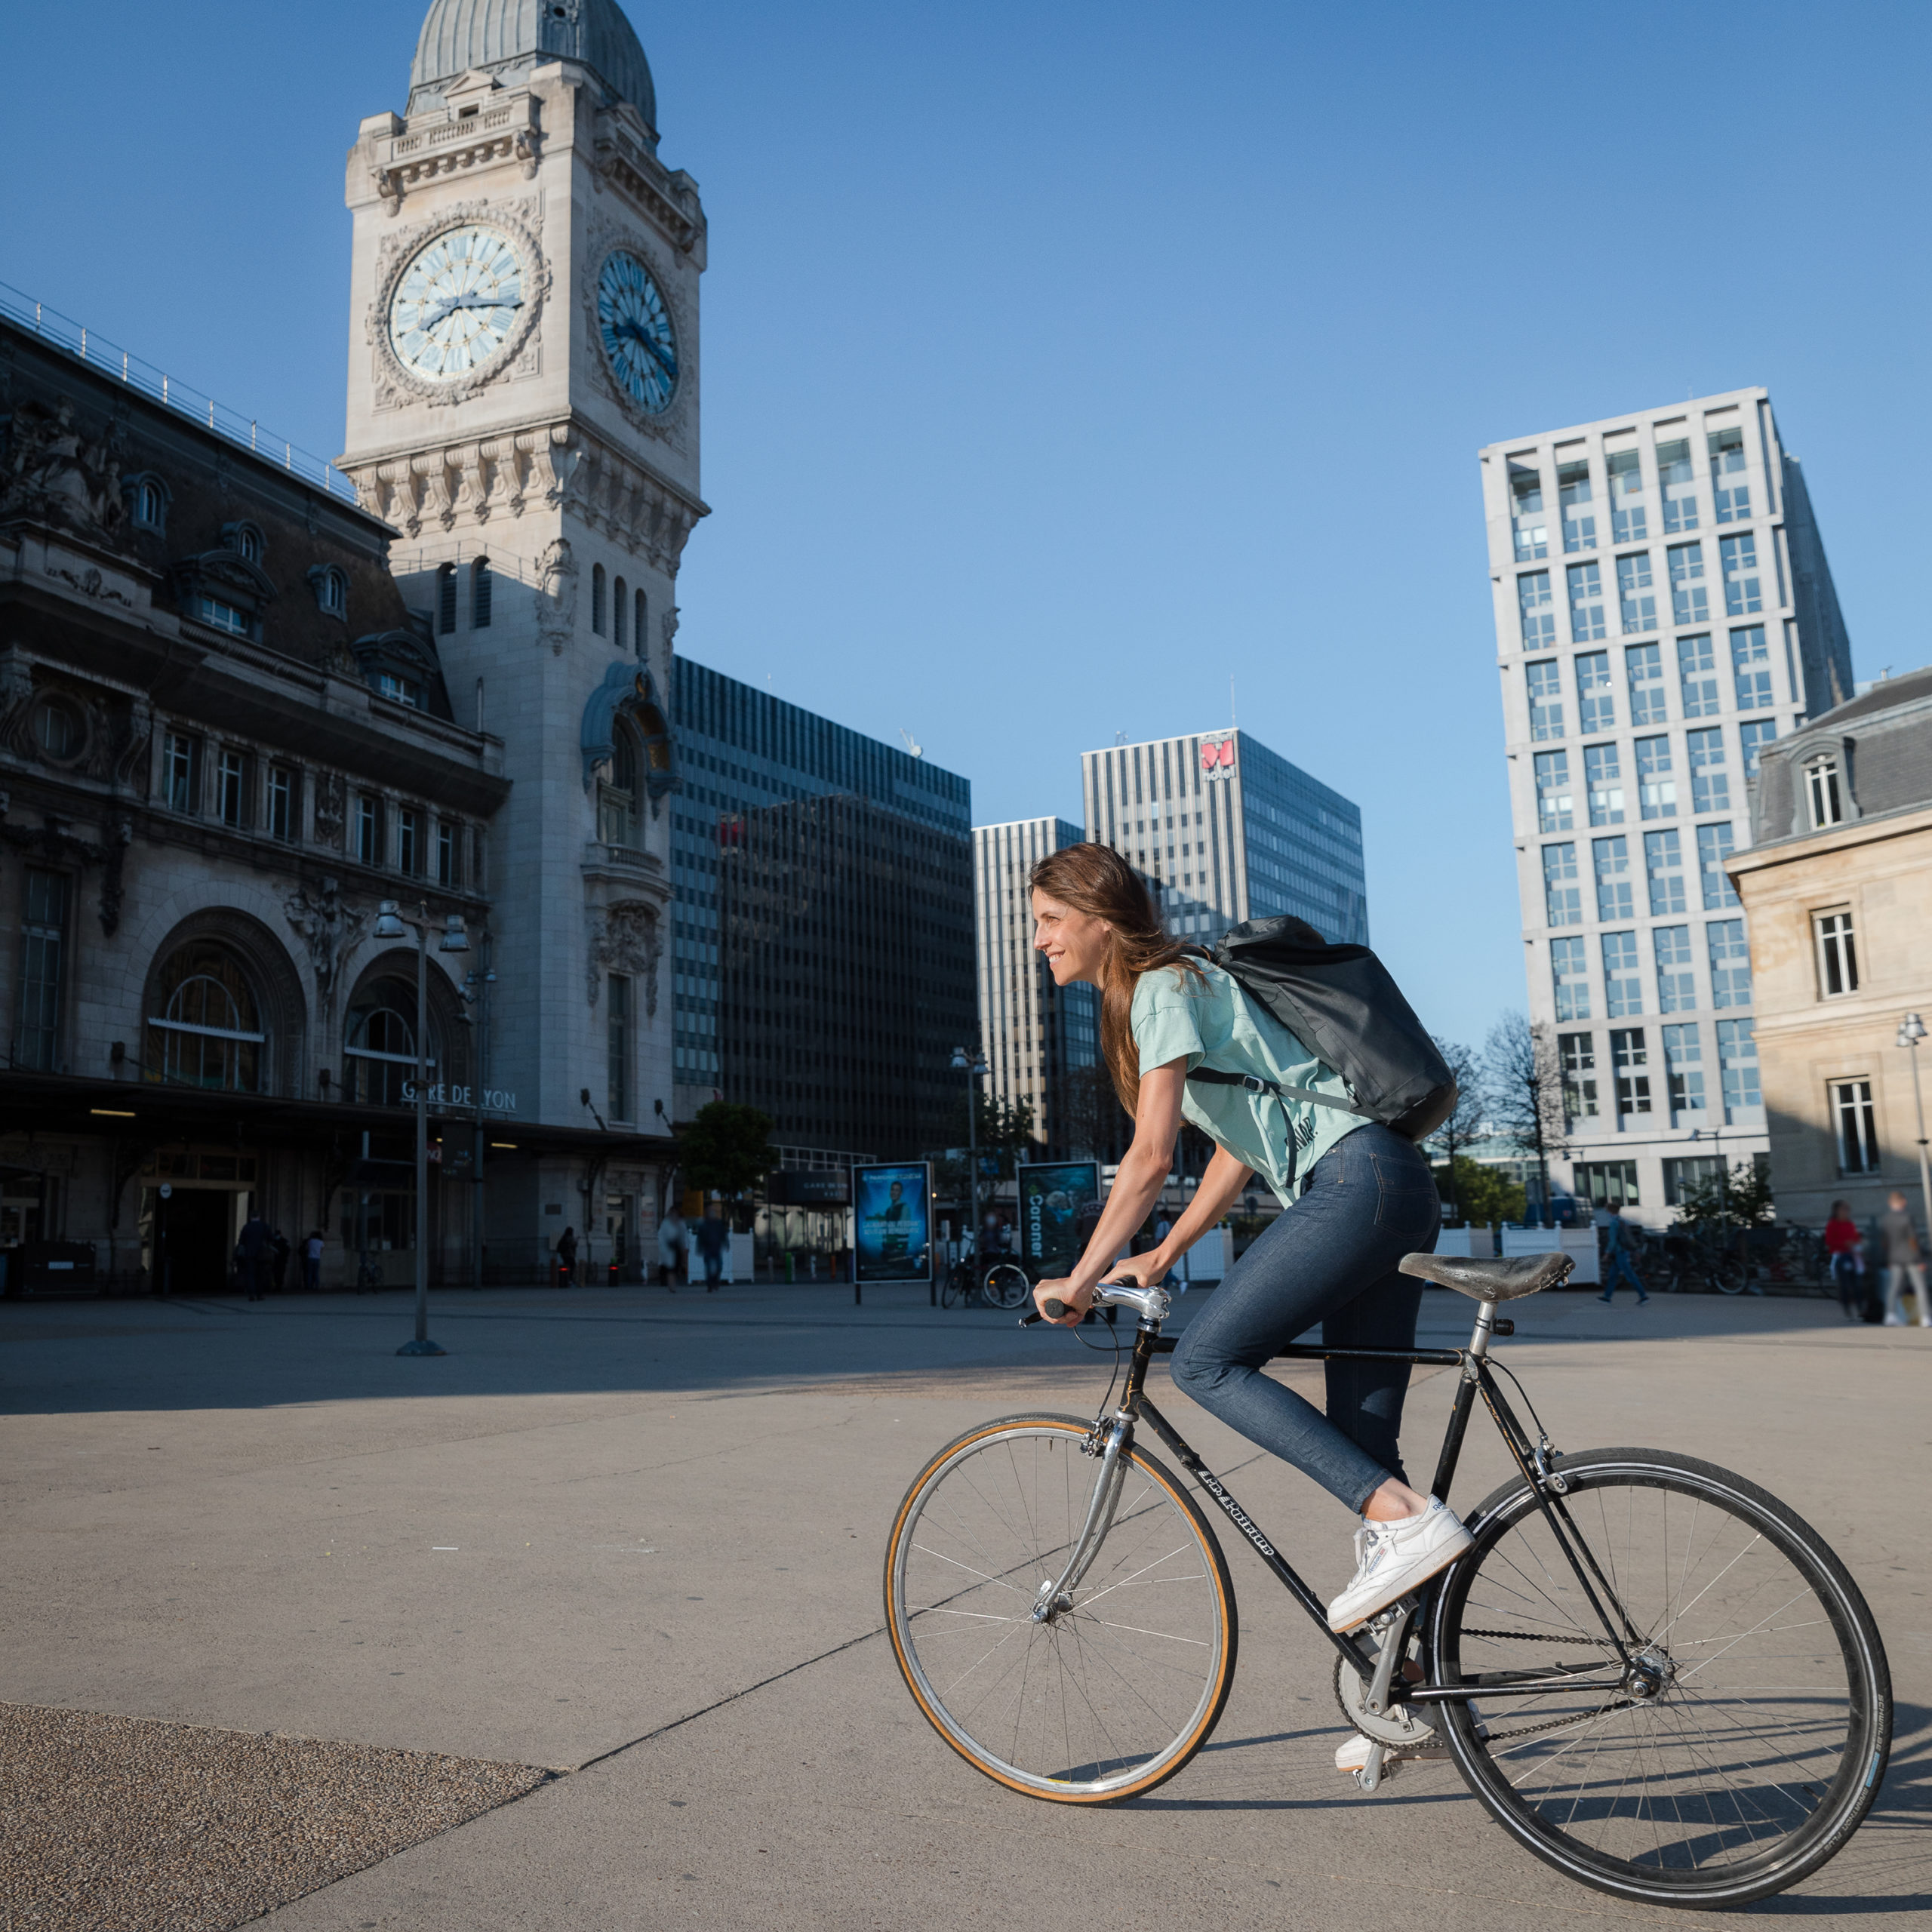 slim fit jeans on a woman riding a bike